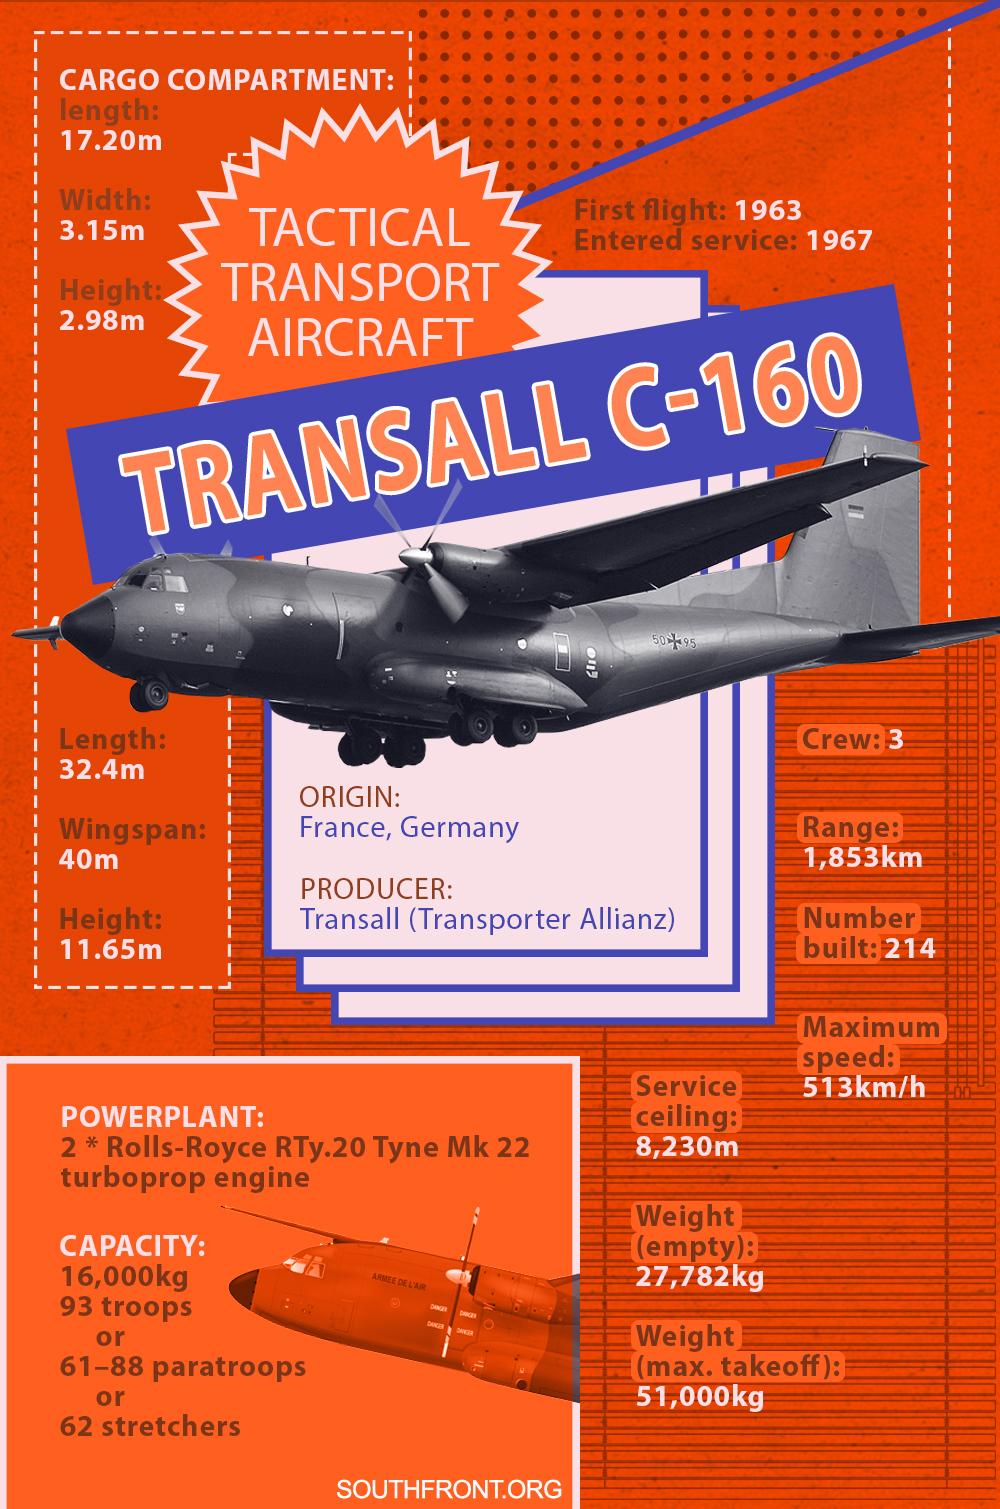 Transall C-160 Military Transport Aircraft (Infographics)